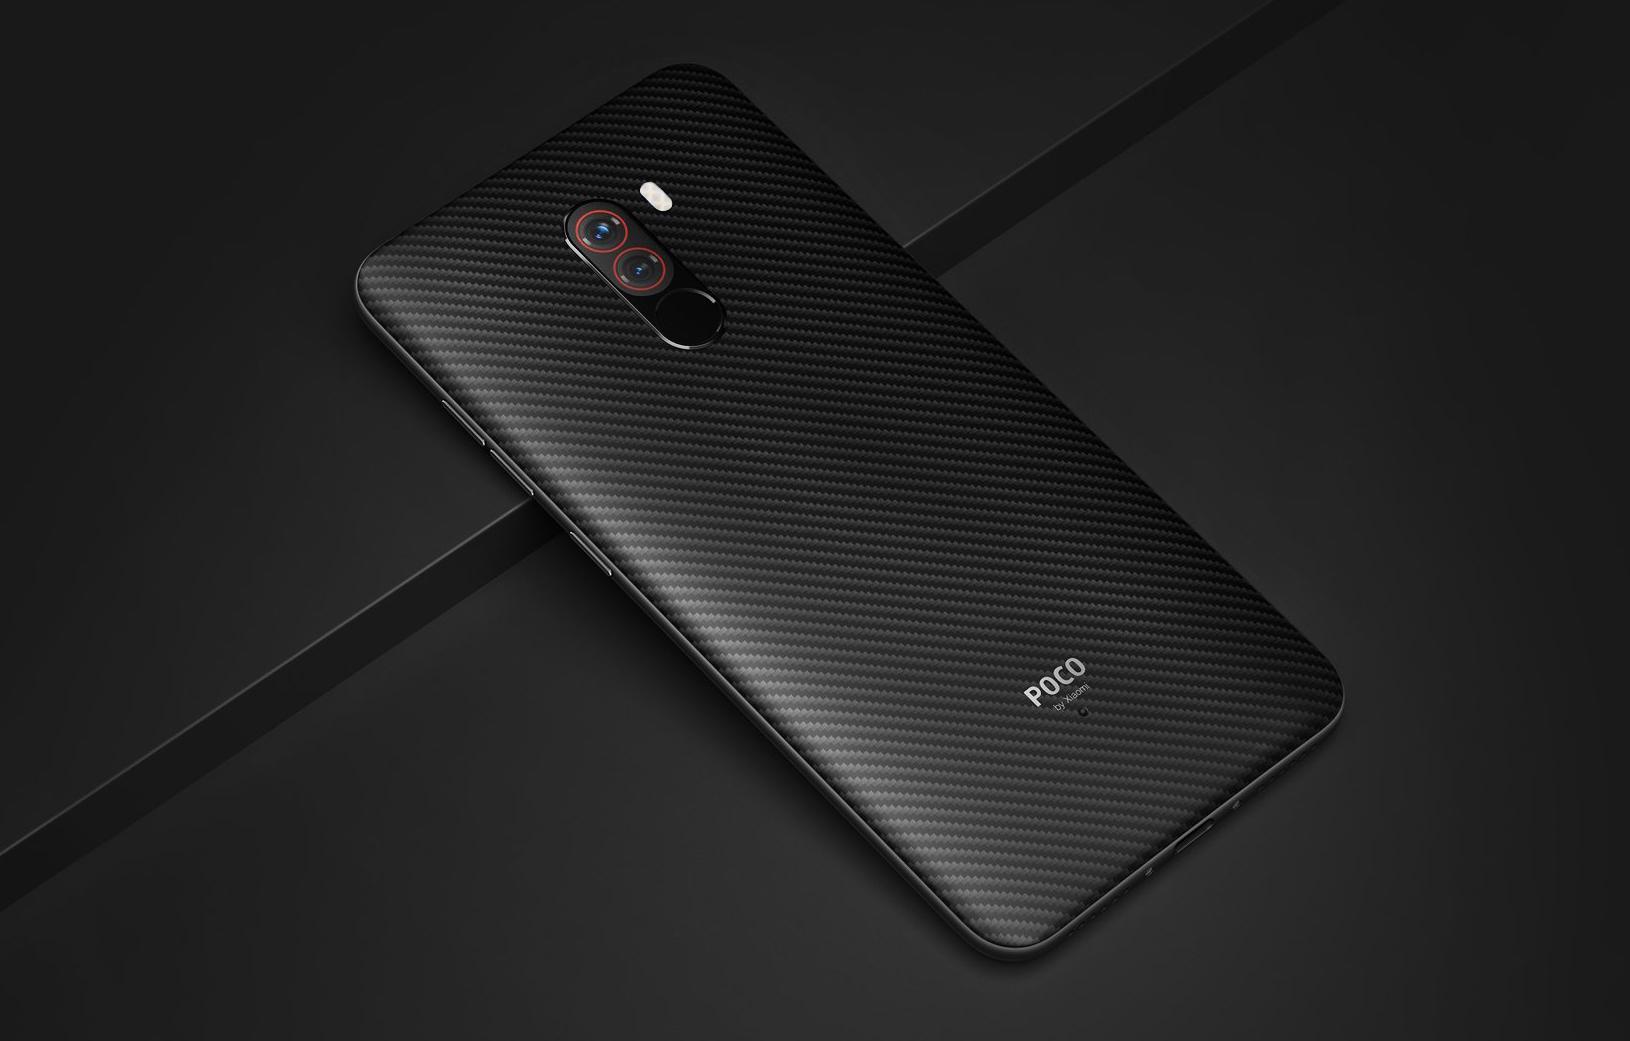 Buy Promotion Xiaomi Pocophone F1 64gb 128gb Local 1 Year By 6gb Warranty Singapore